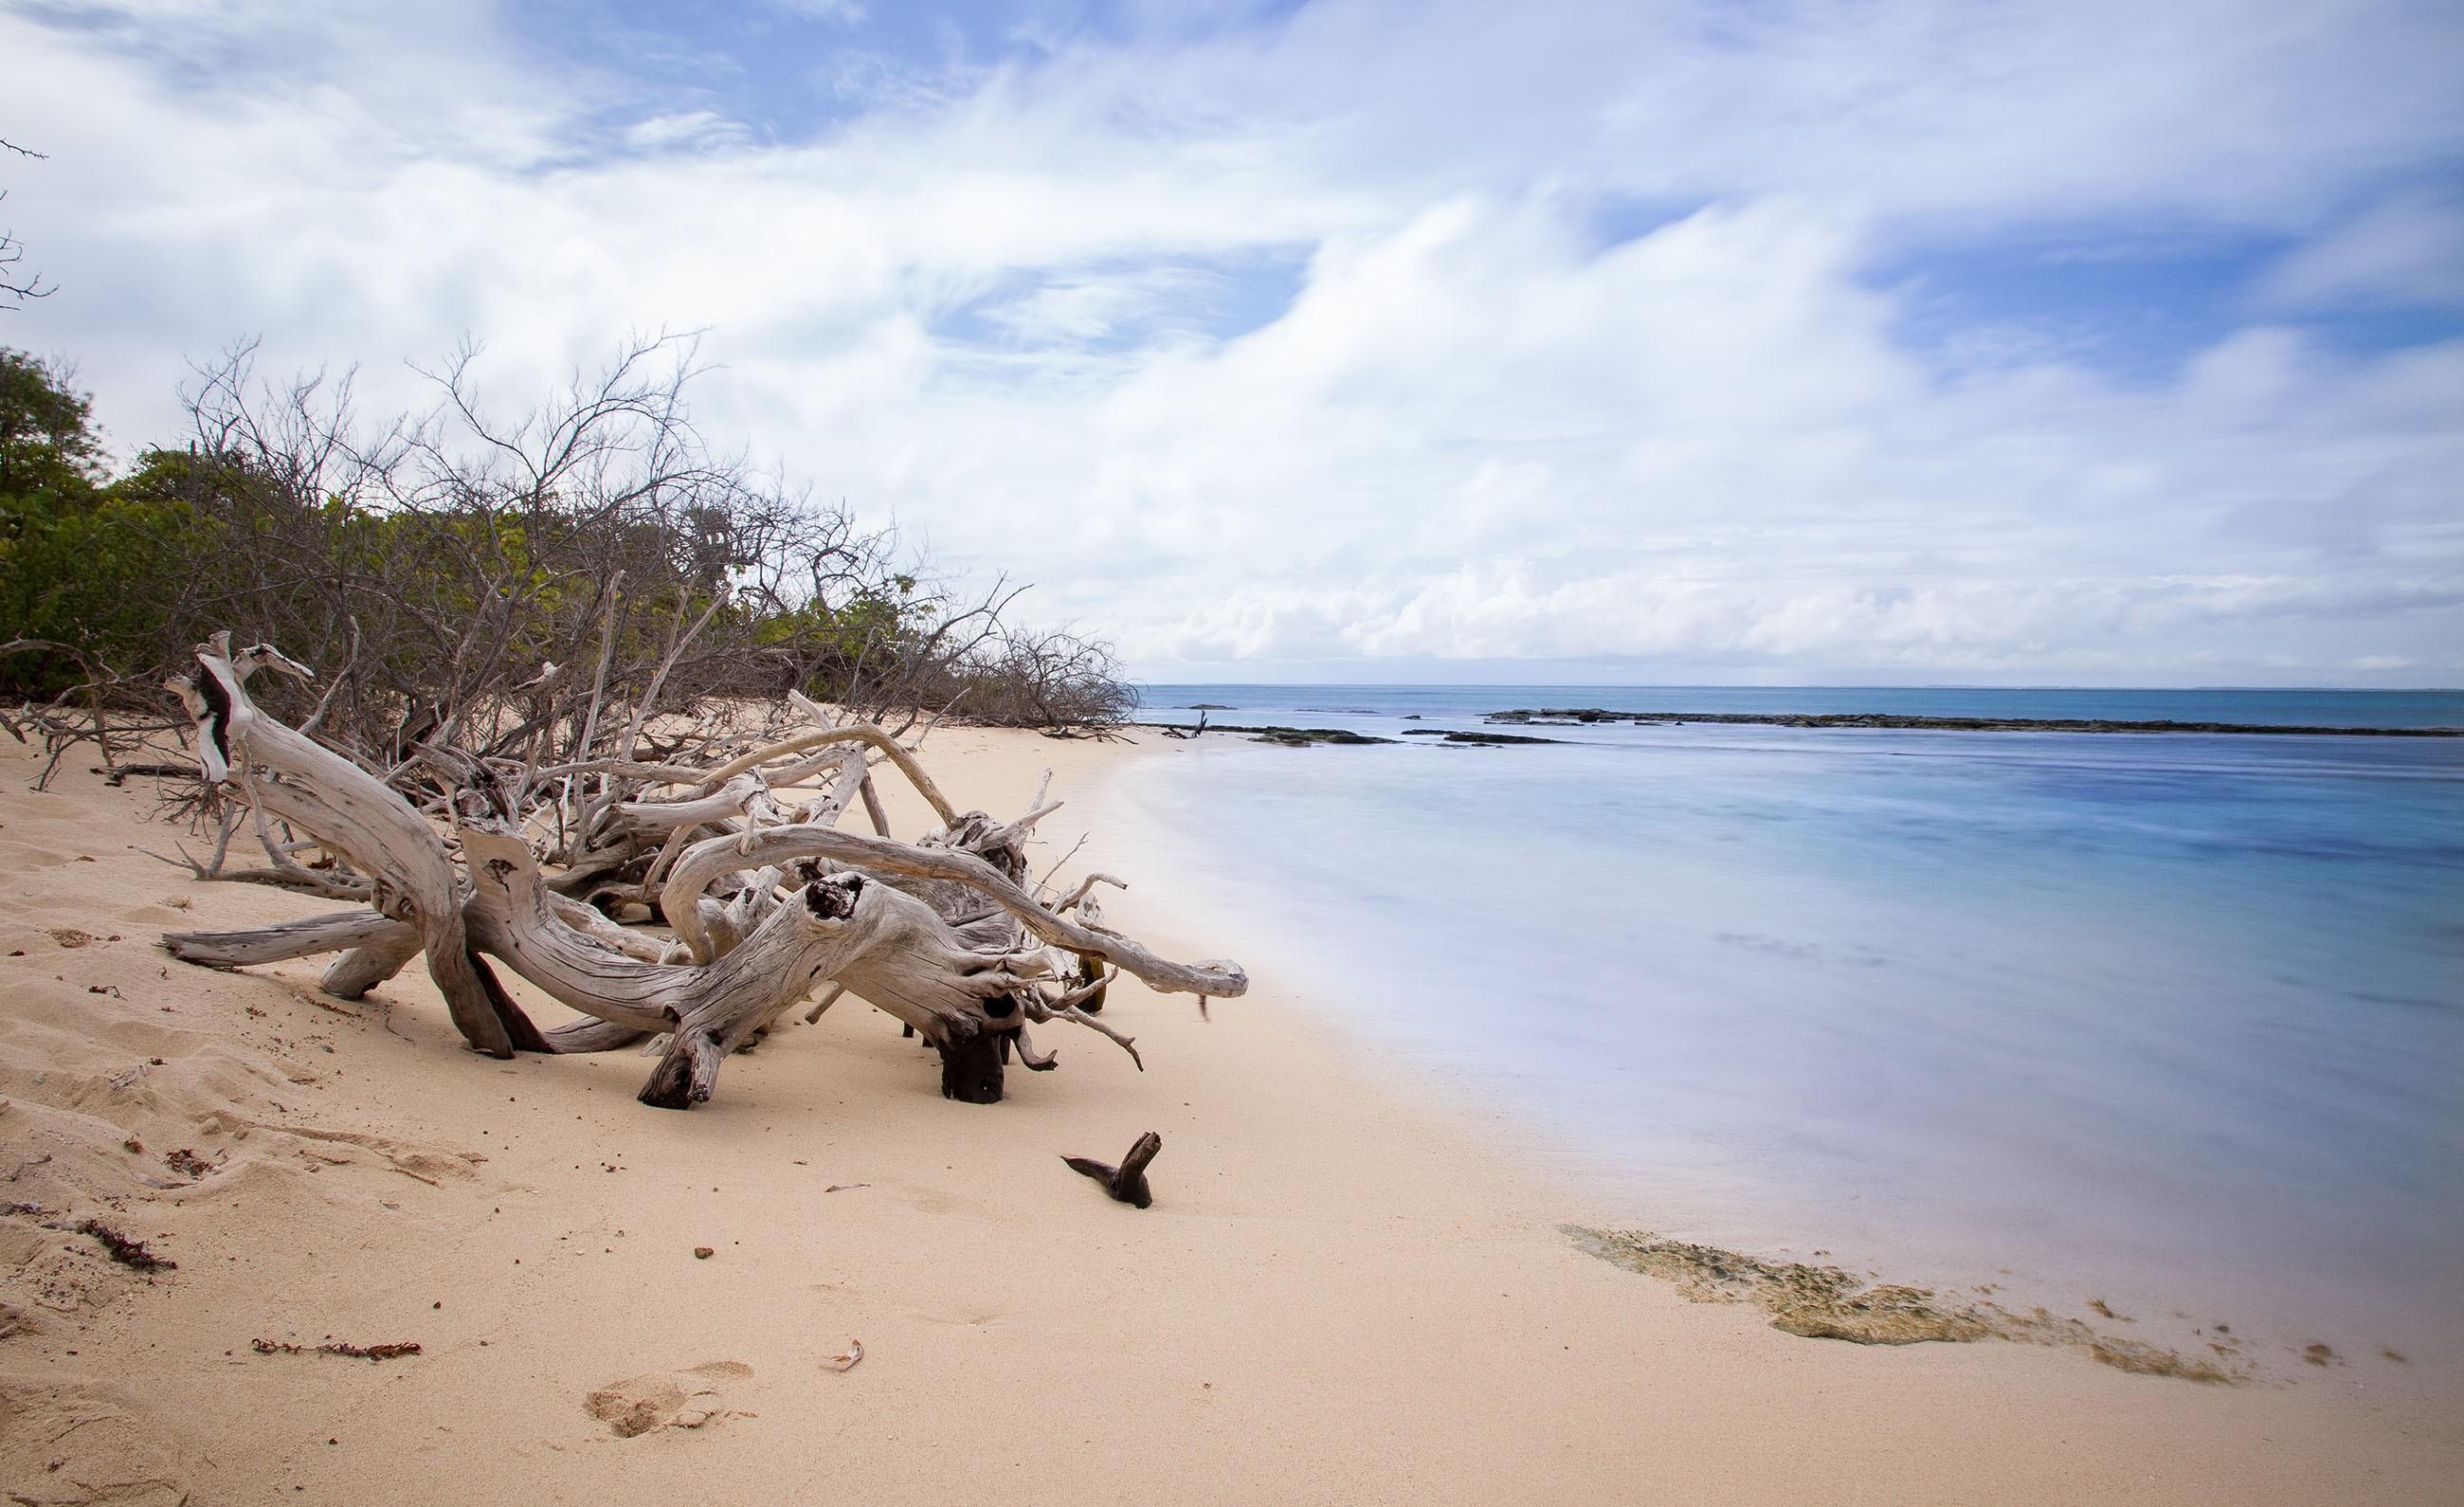 beach-petiteterre-guadeloupe-france-paradise-island-caribbean-nobody